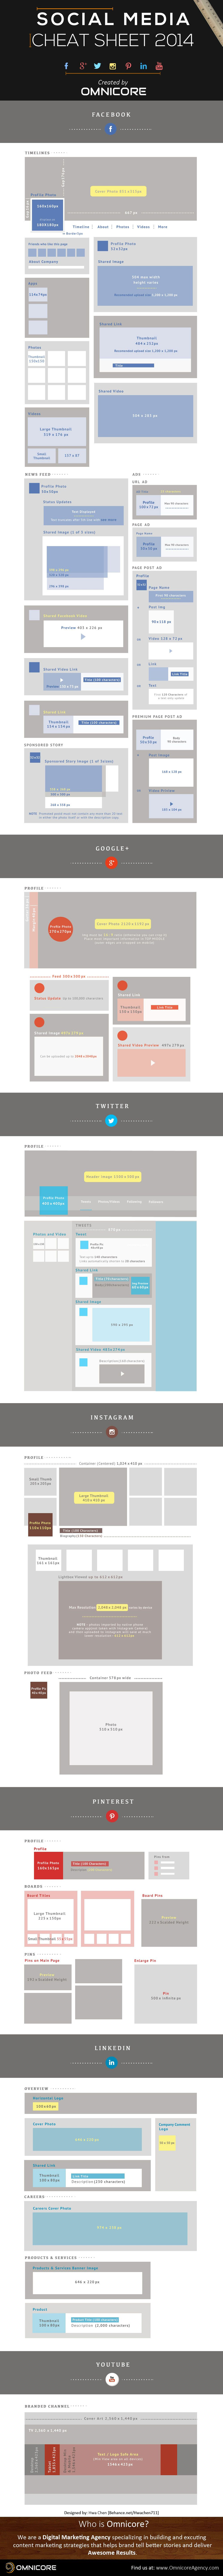 Image sizes for #SocialMedia #Infographic